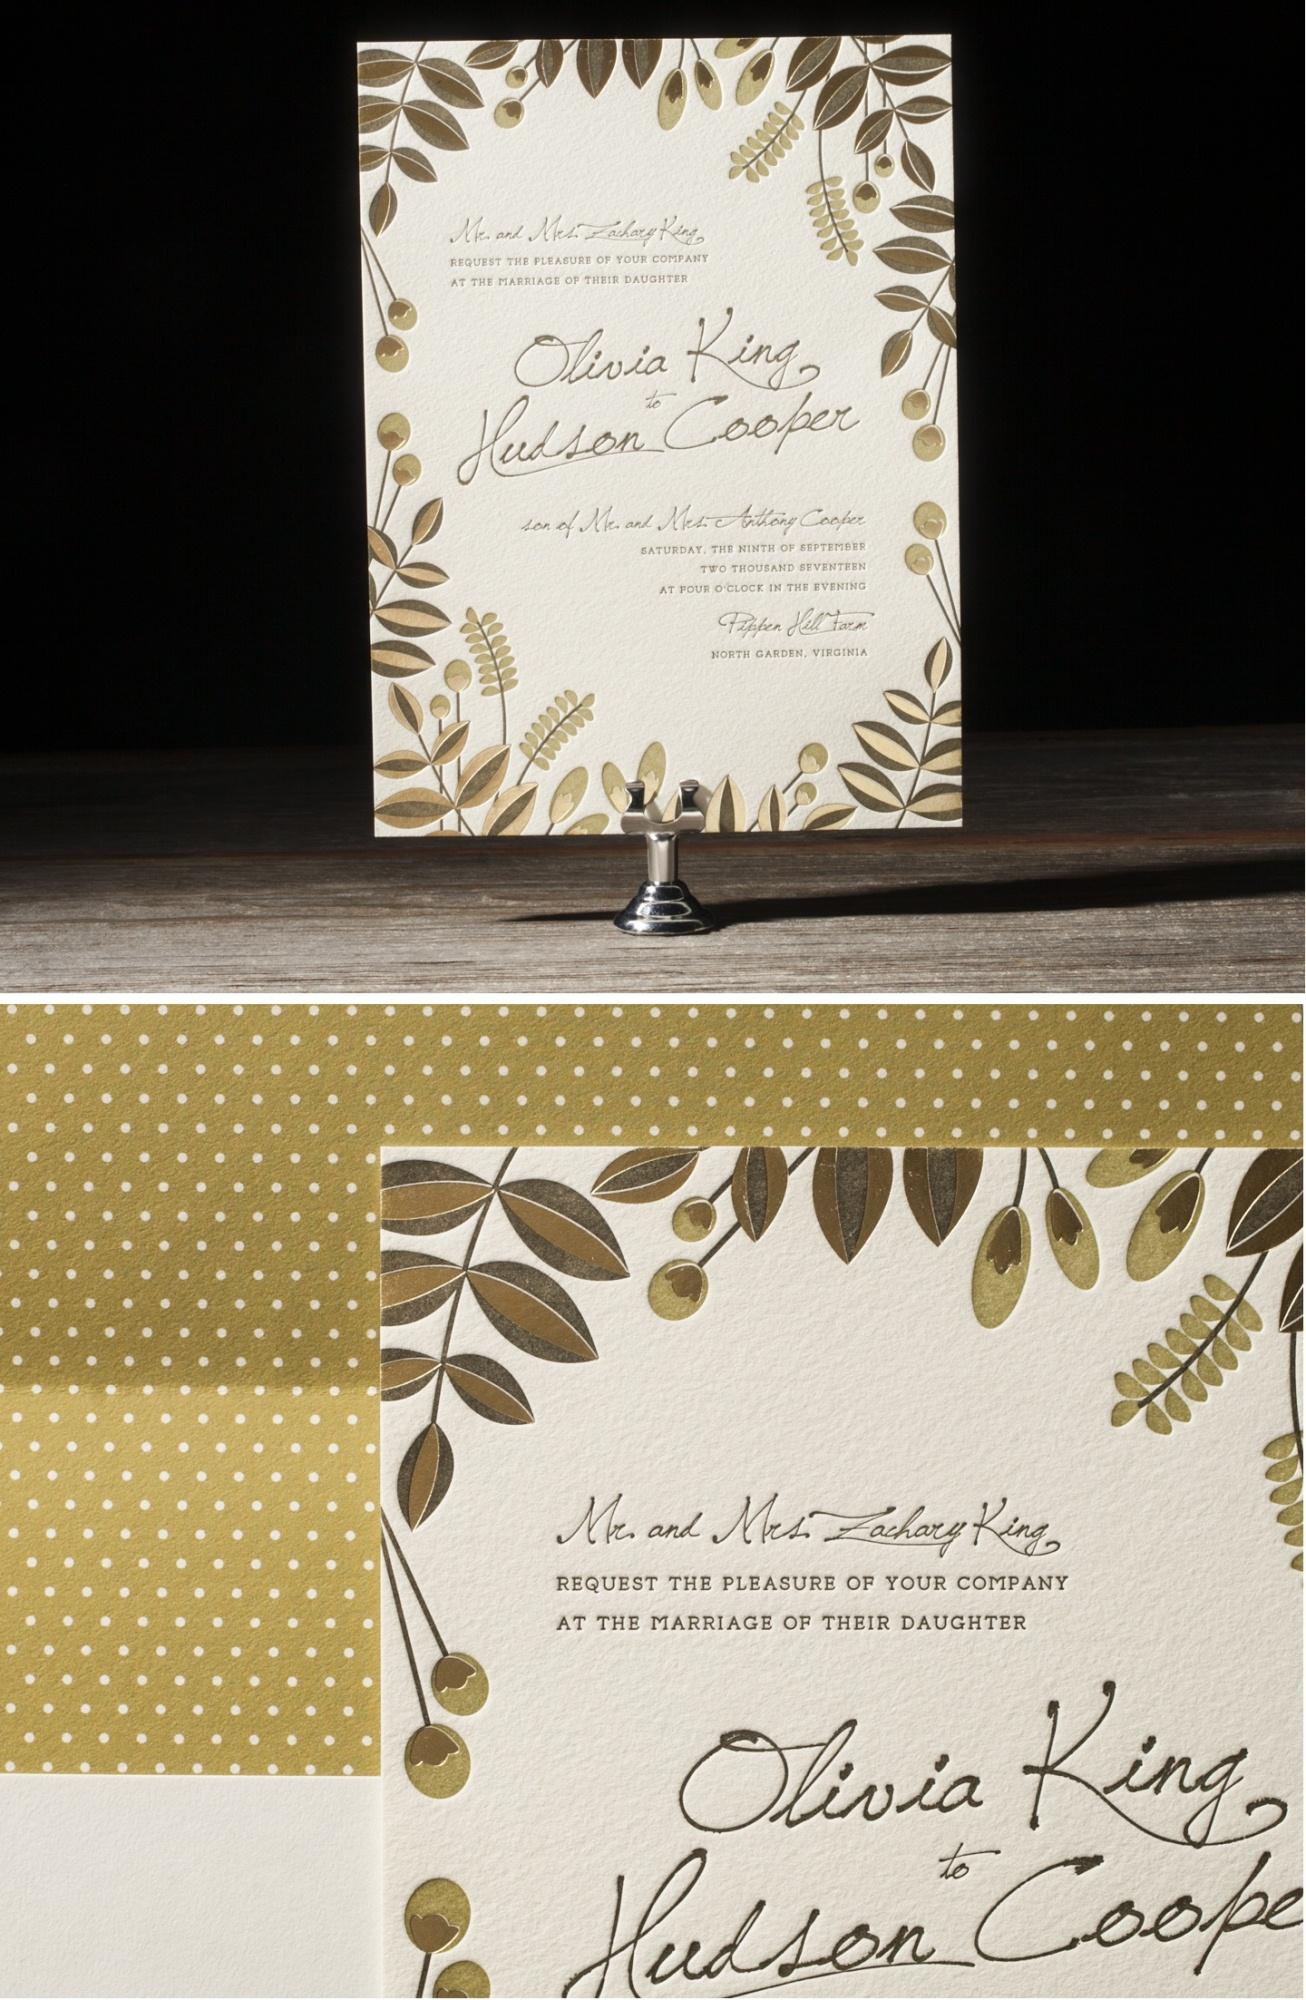 Bittersweet Foil Letterpress Wedding Stationery from Bella Figura's 2014 Collection